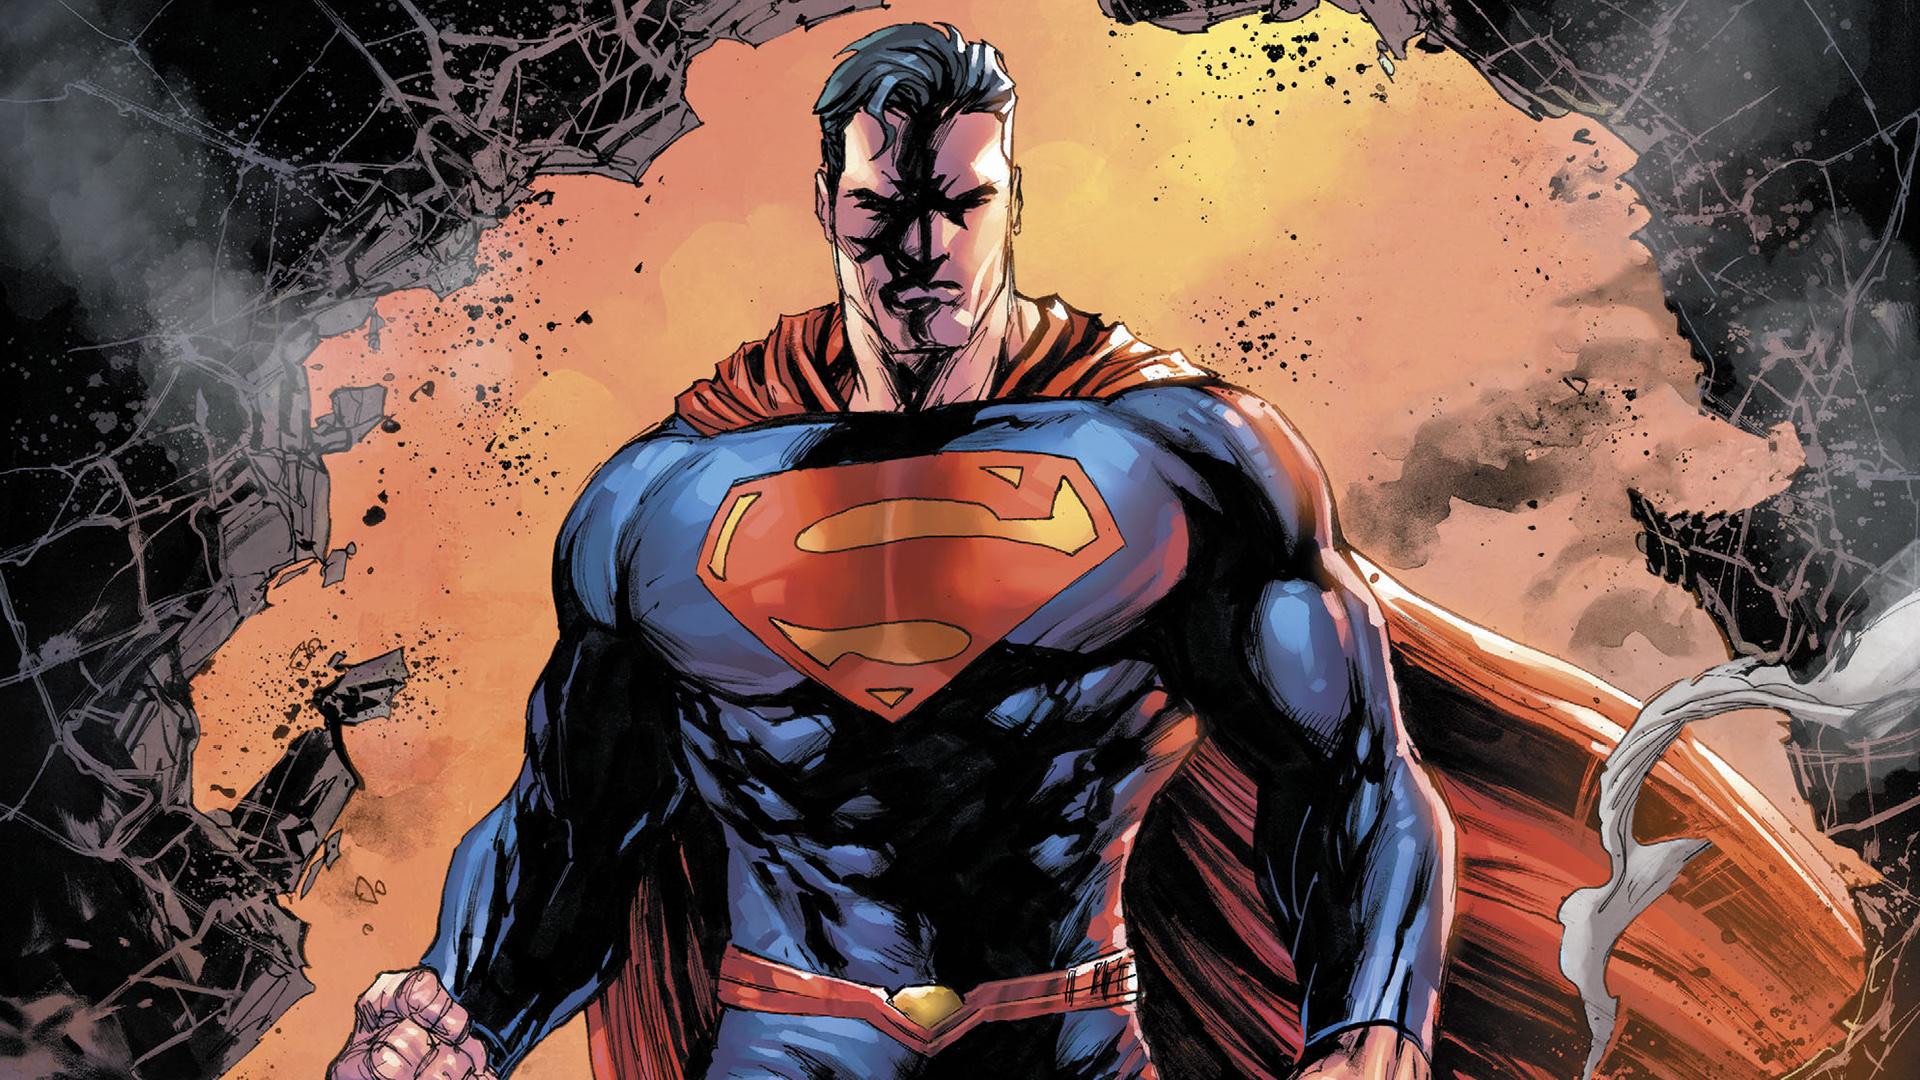 Best Looking Cars Wallpapers Superman Dc Comics Hd Superheroes 4k Wallpapers Images